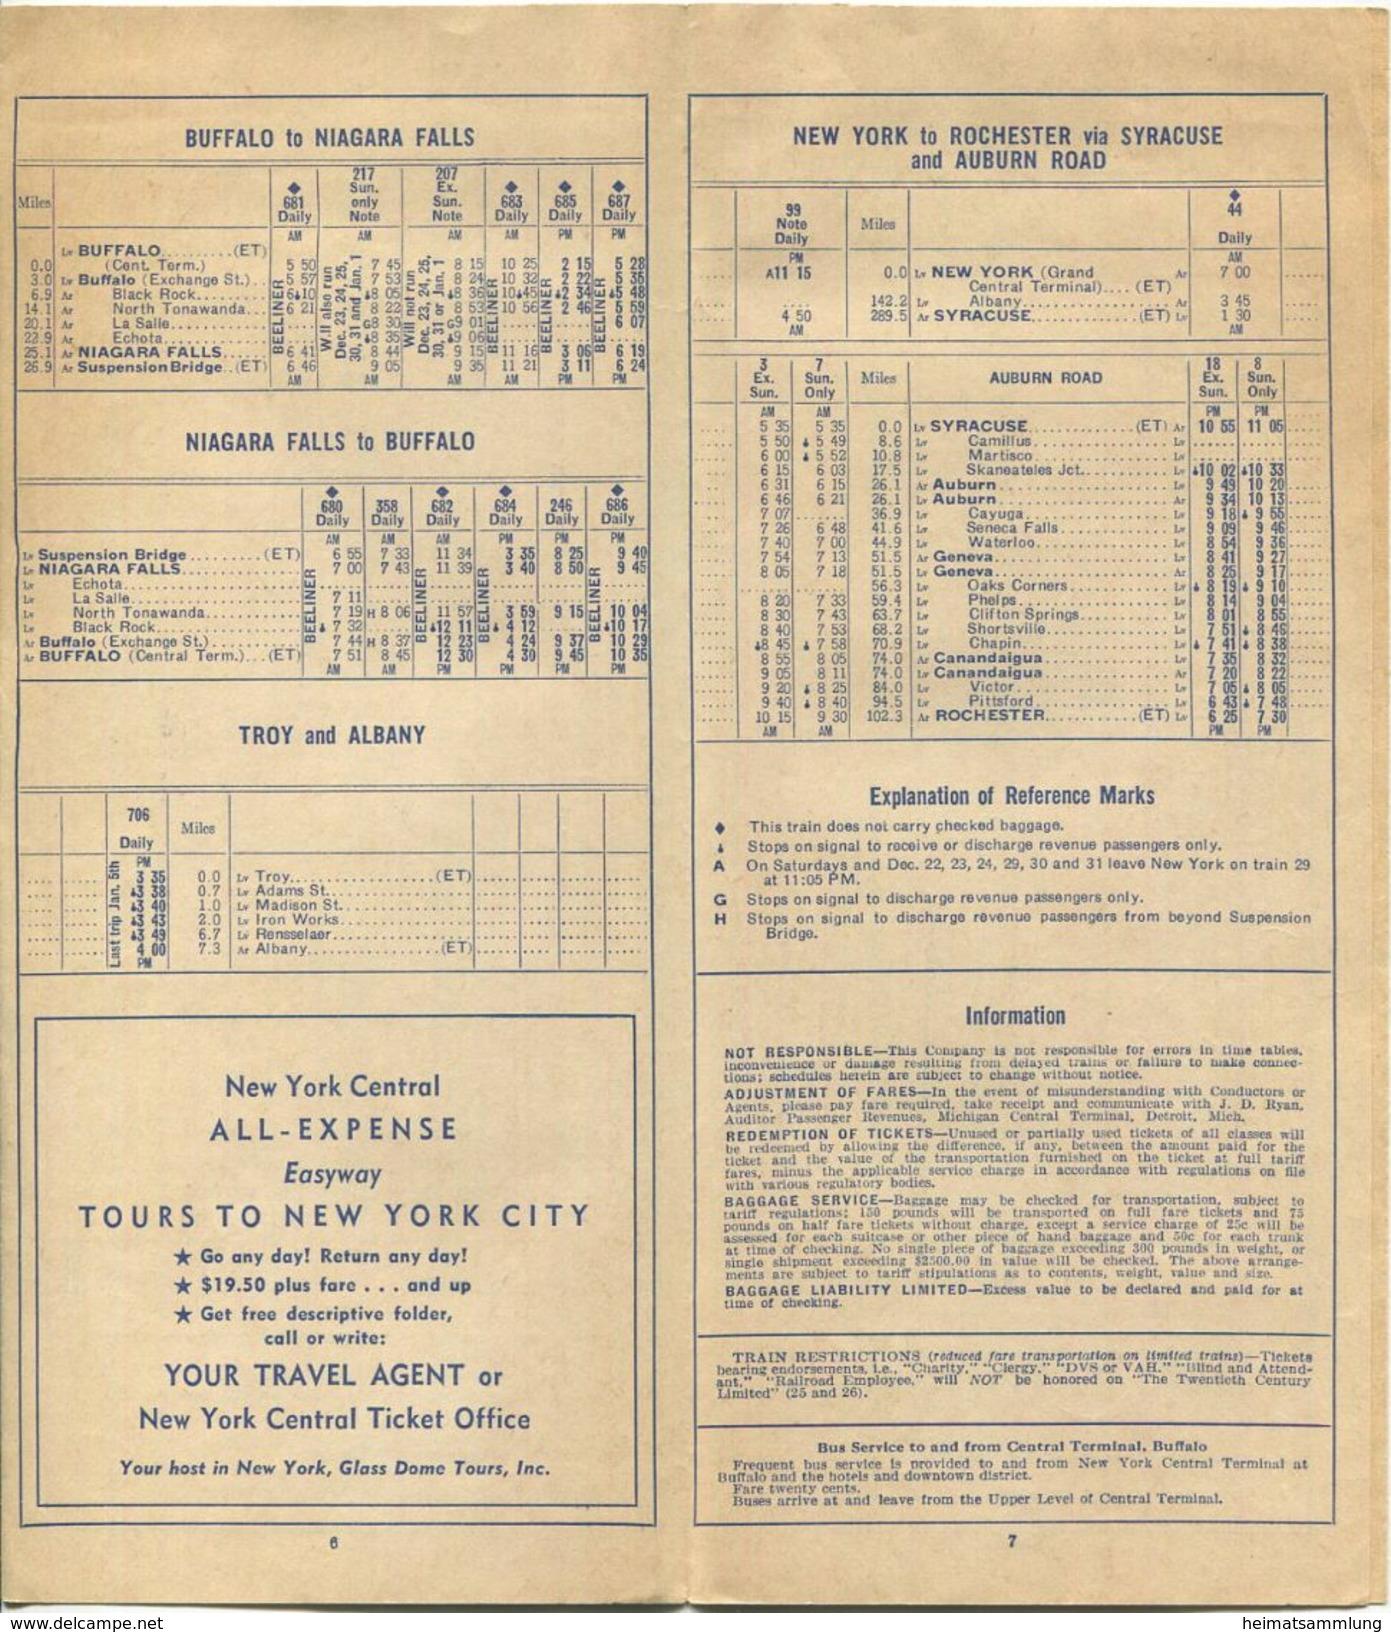 New York State - New York Central - Area Time Table - Faltblatt 1957 - World